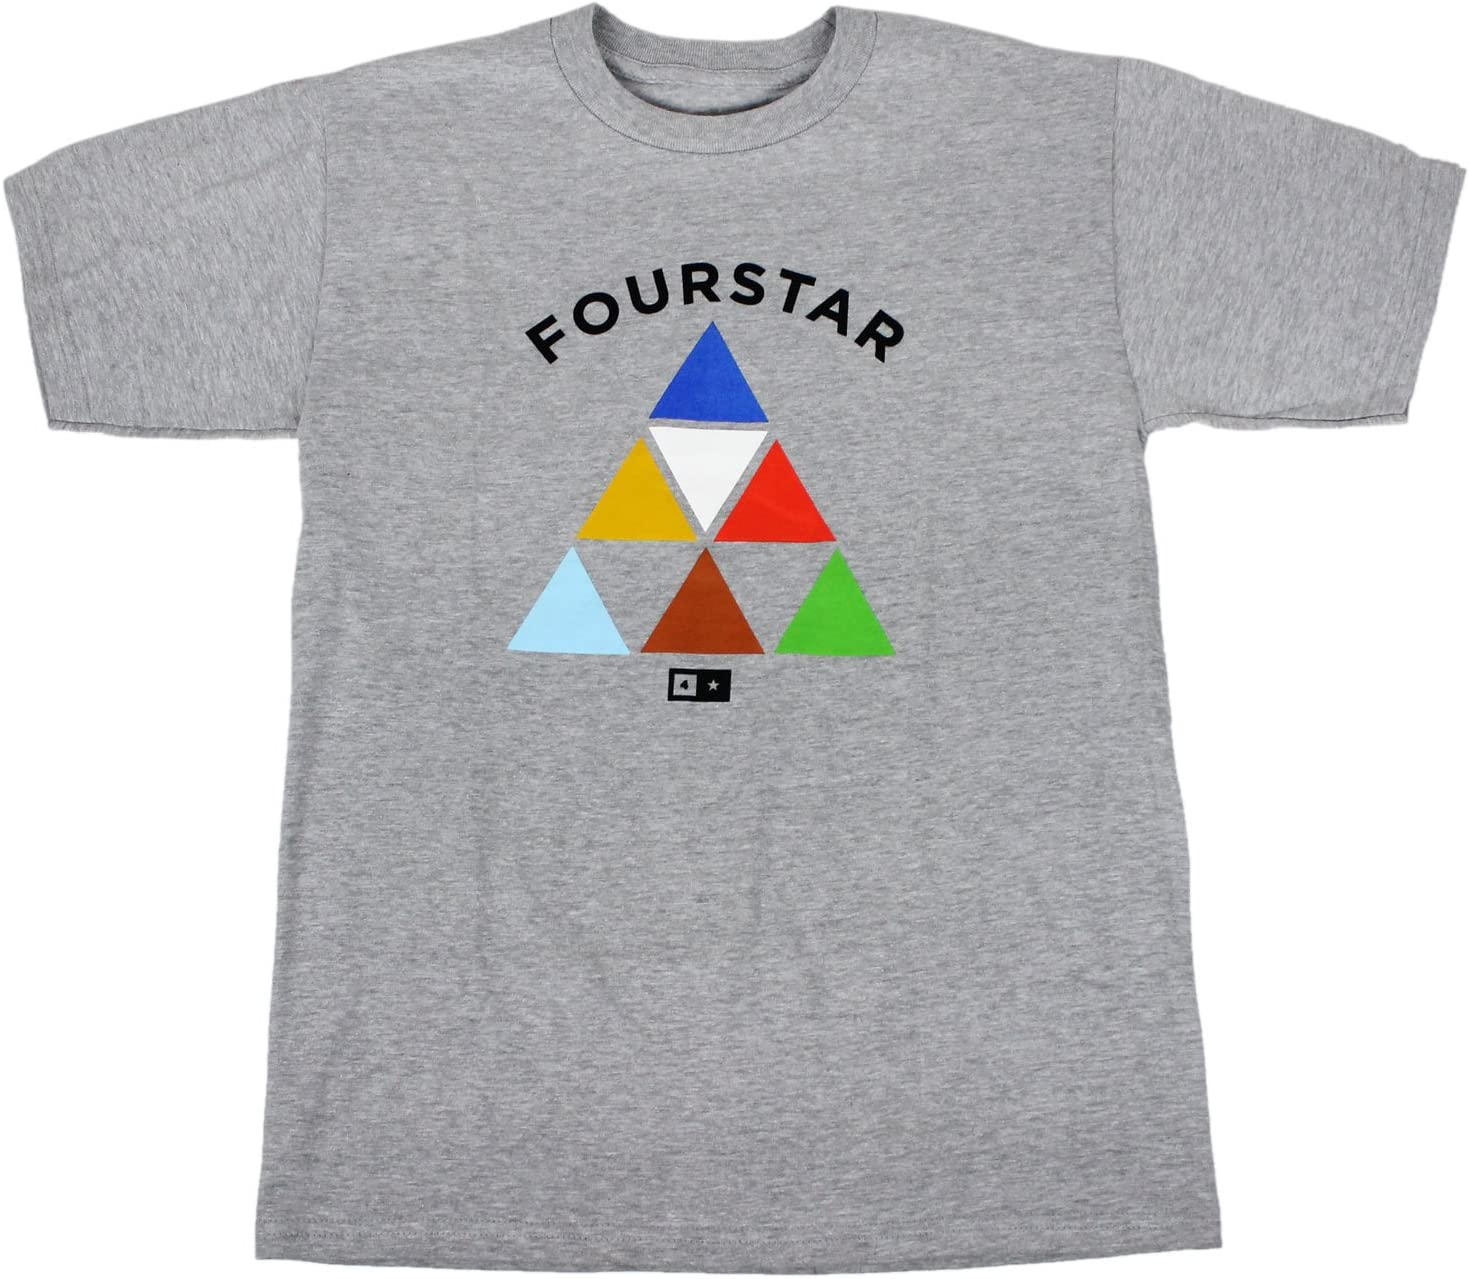 Fourstar Skate camiseta triángulos gris tamaño S: Amazon.es ...